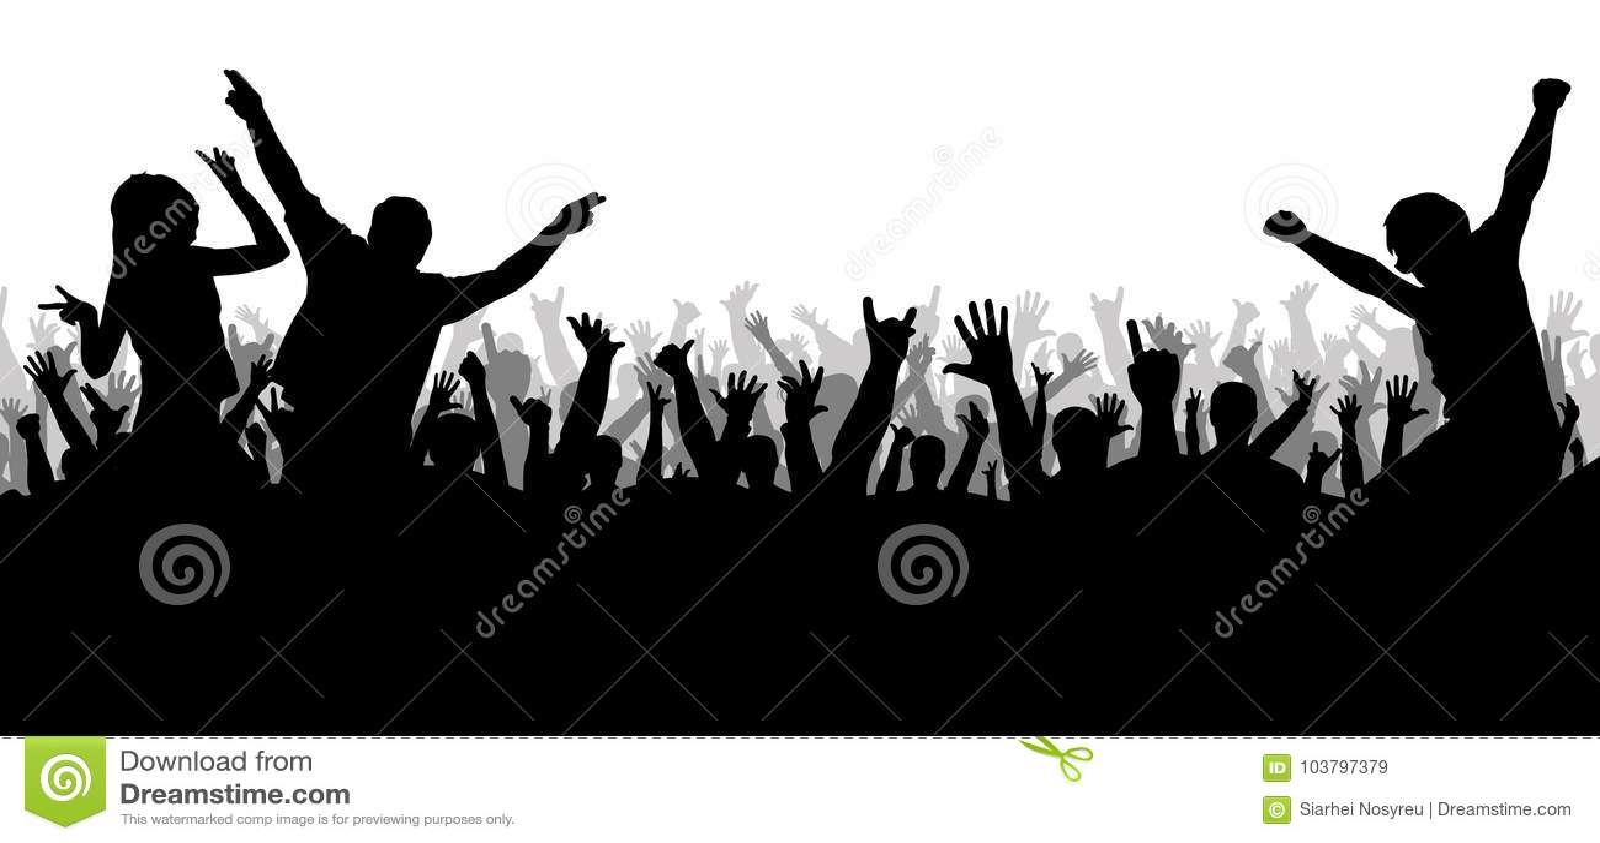 Disco de concert, silhouette de danse de foule